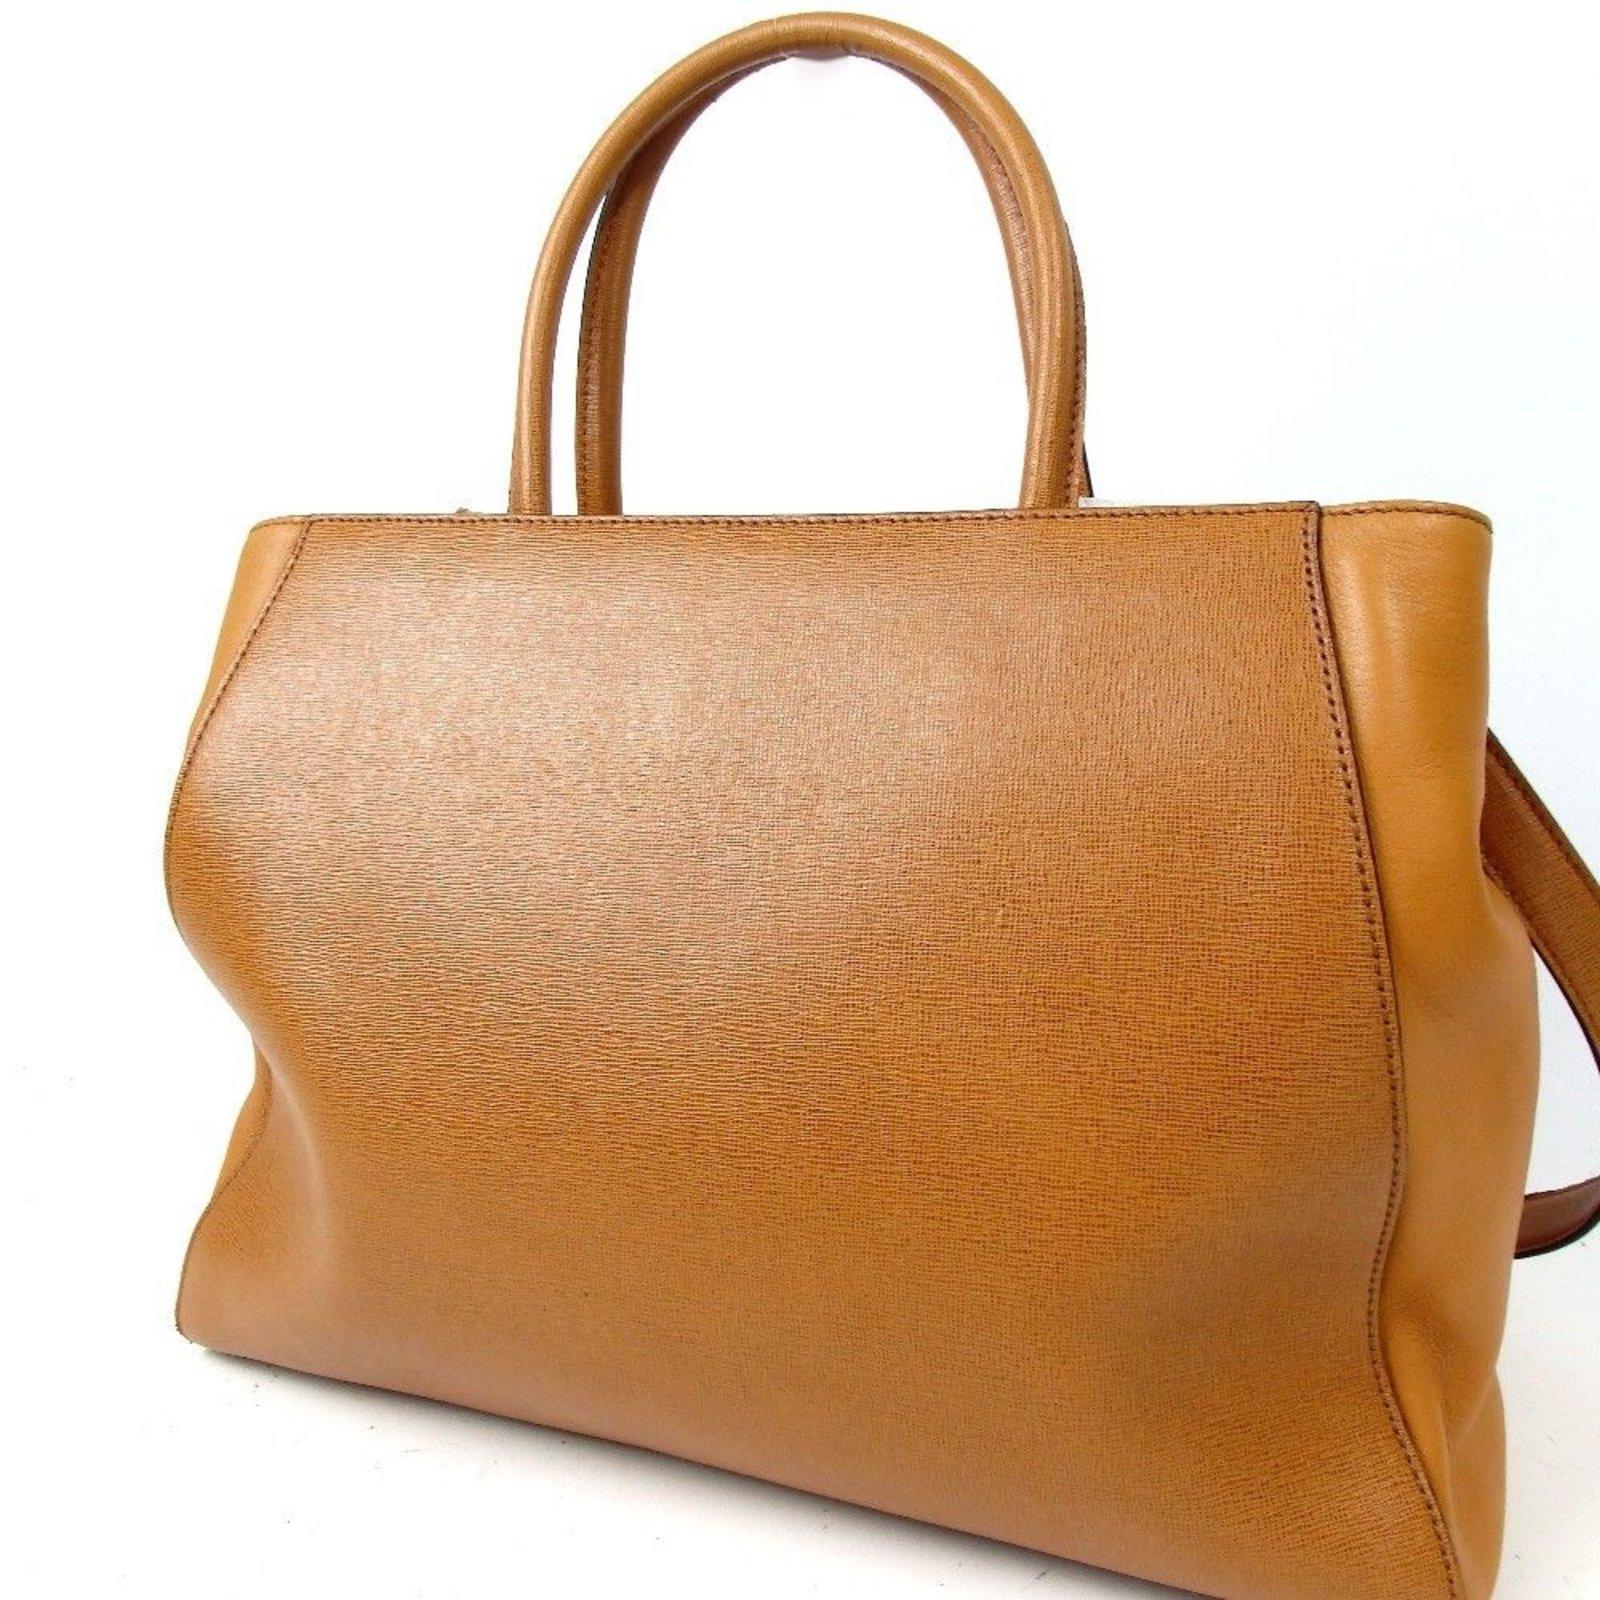 c113ebc1b58e Fendi FENDI 2way 2JOUR SHOPPING BAG Handbags Leather Cognac